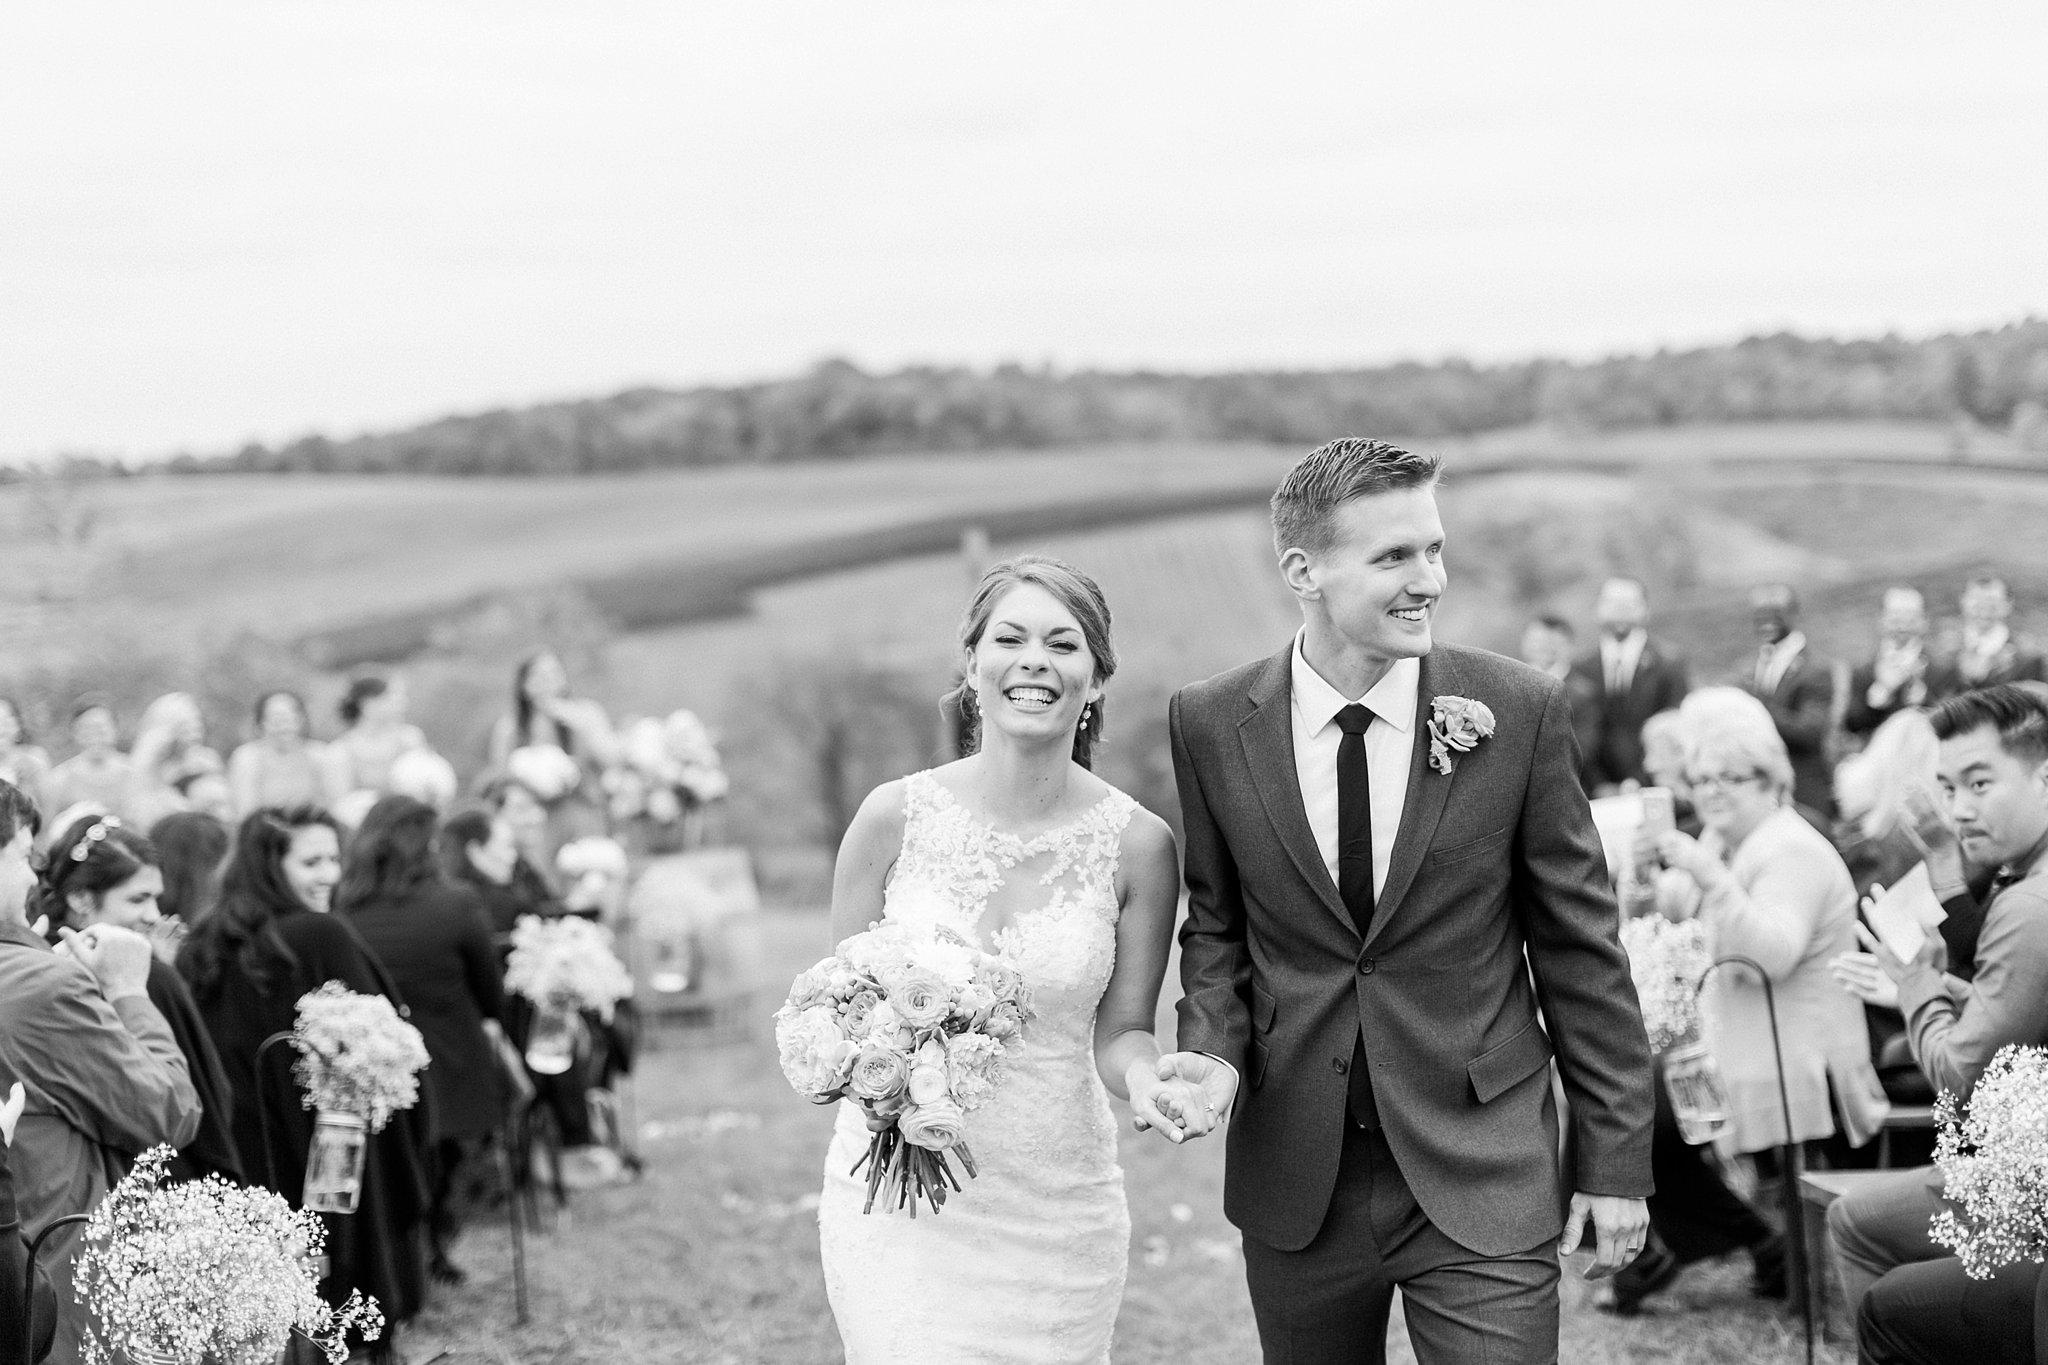 Stone Tower Winery Wedding Photos Virginia Wedding Photographer Megan Kelsey Photography Sam & Angela-172.jpg